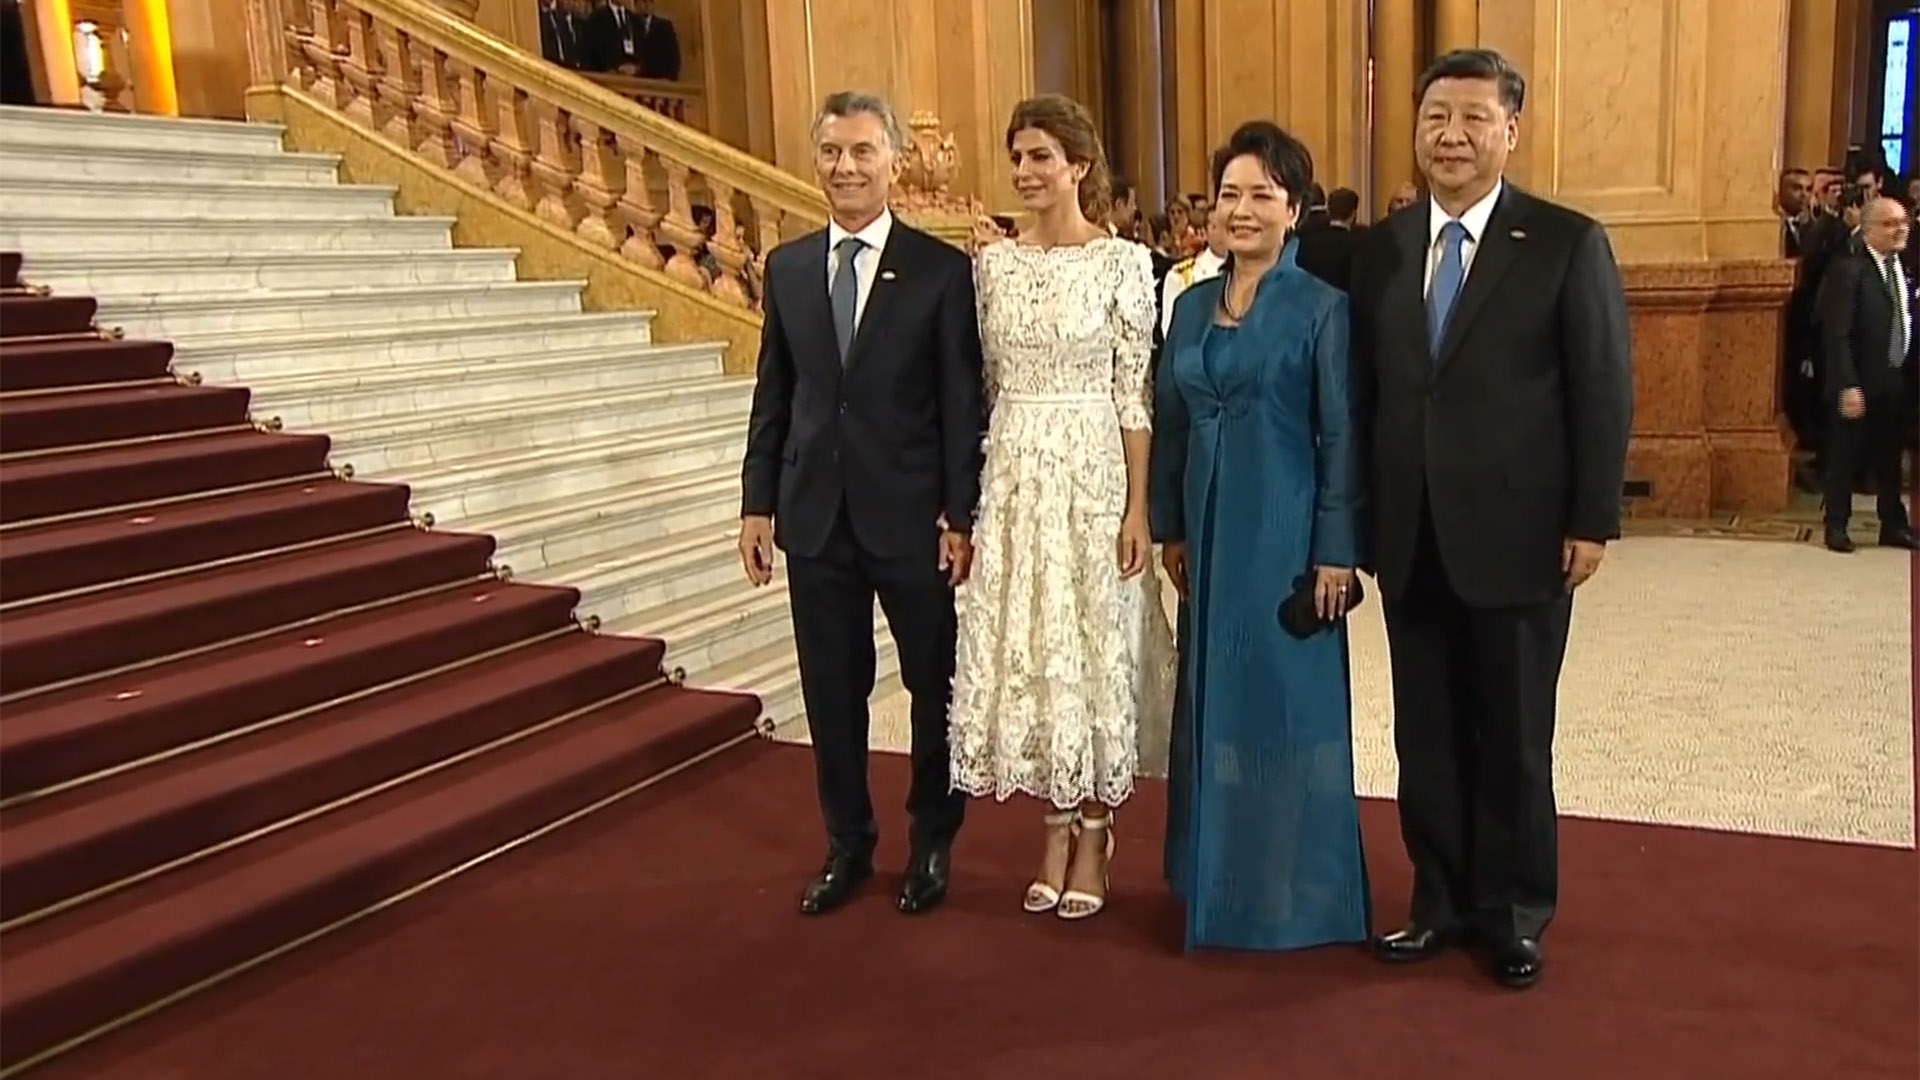 Macri y Awada recibieron a Xi Jinping y su esposa Peng Liyuan